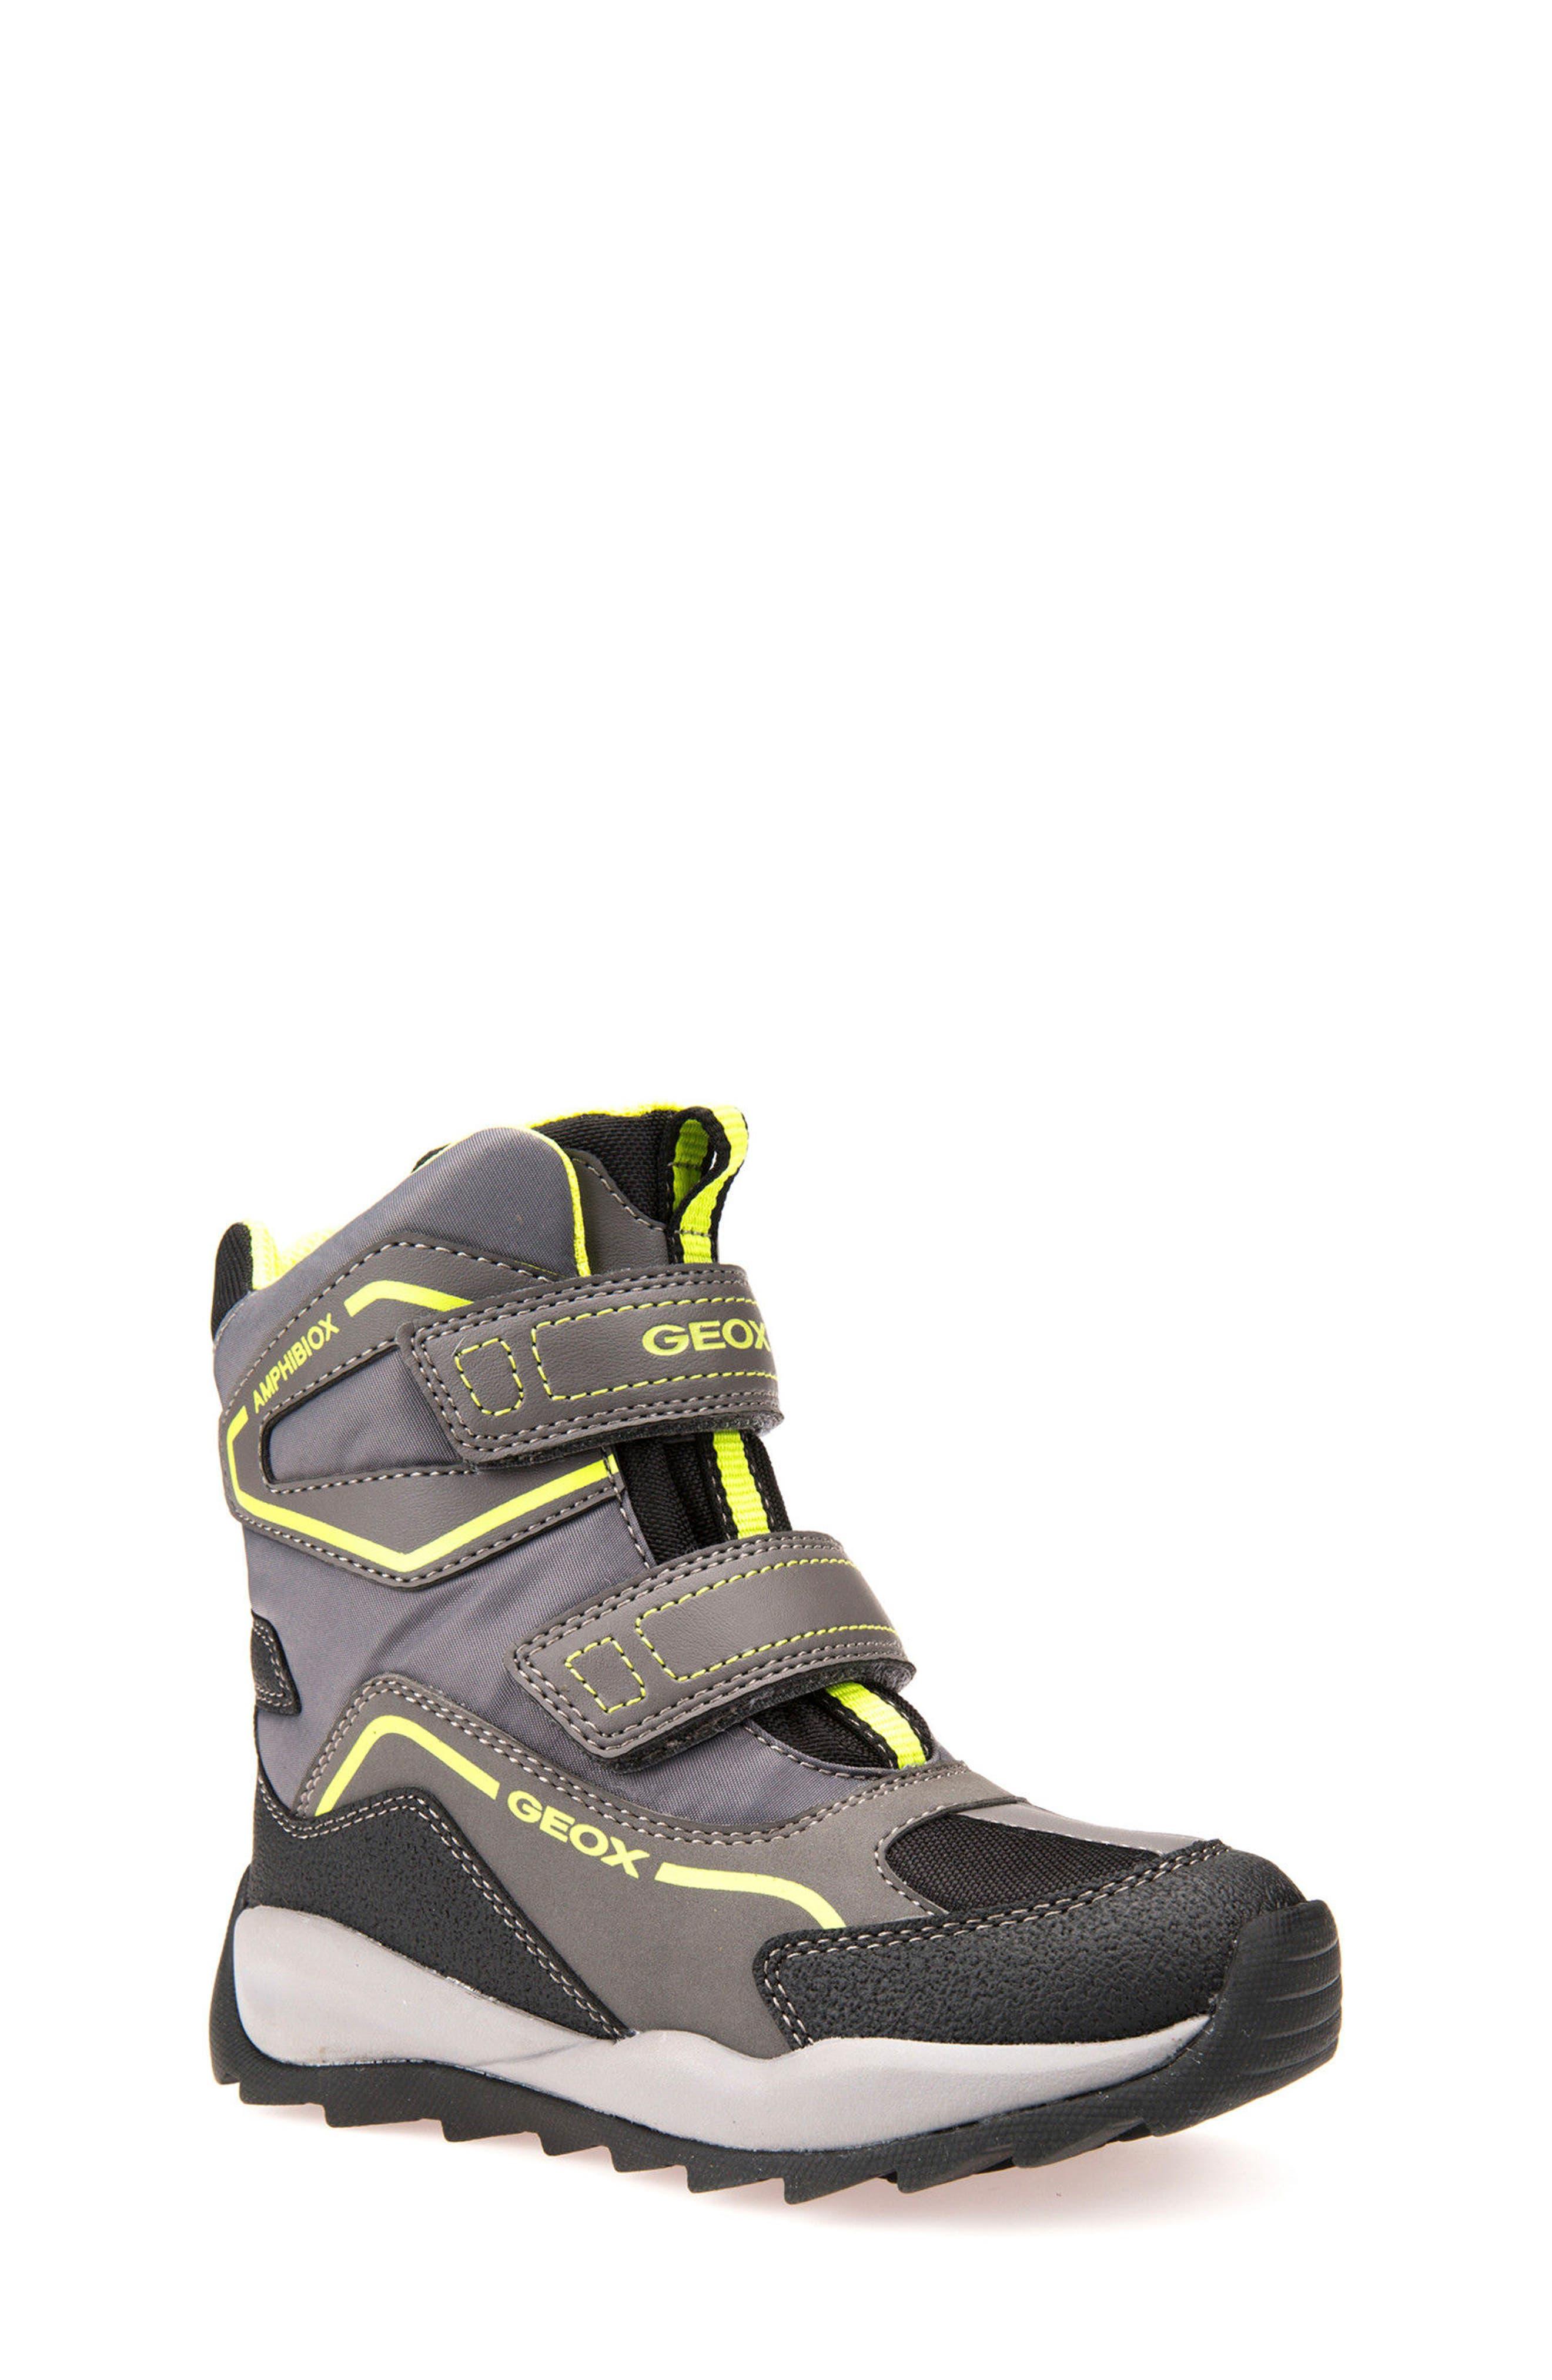 Geox Orizont ABX Waterproof Boot (Toddler, Little Kid & Big Kid)